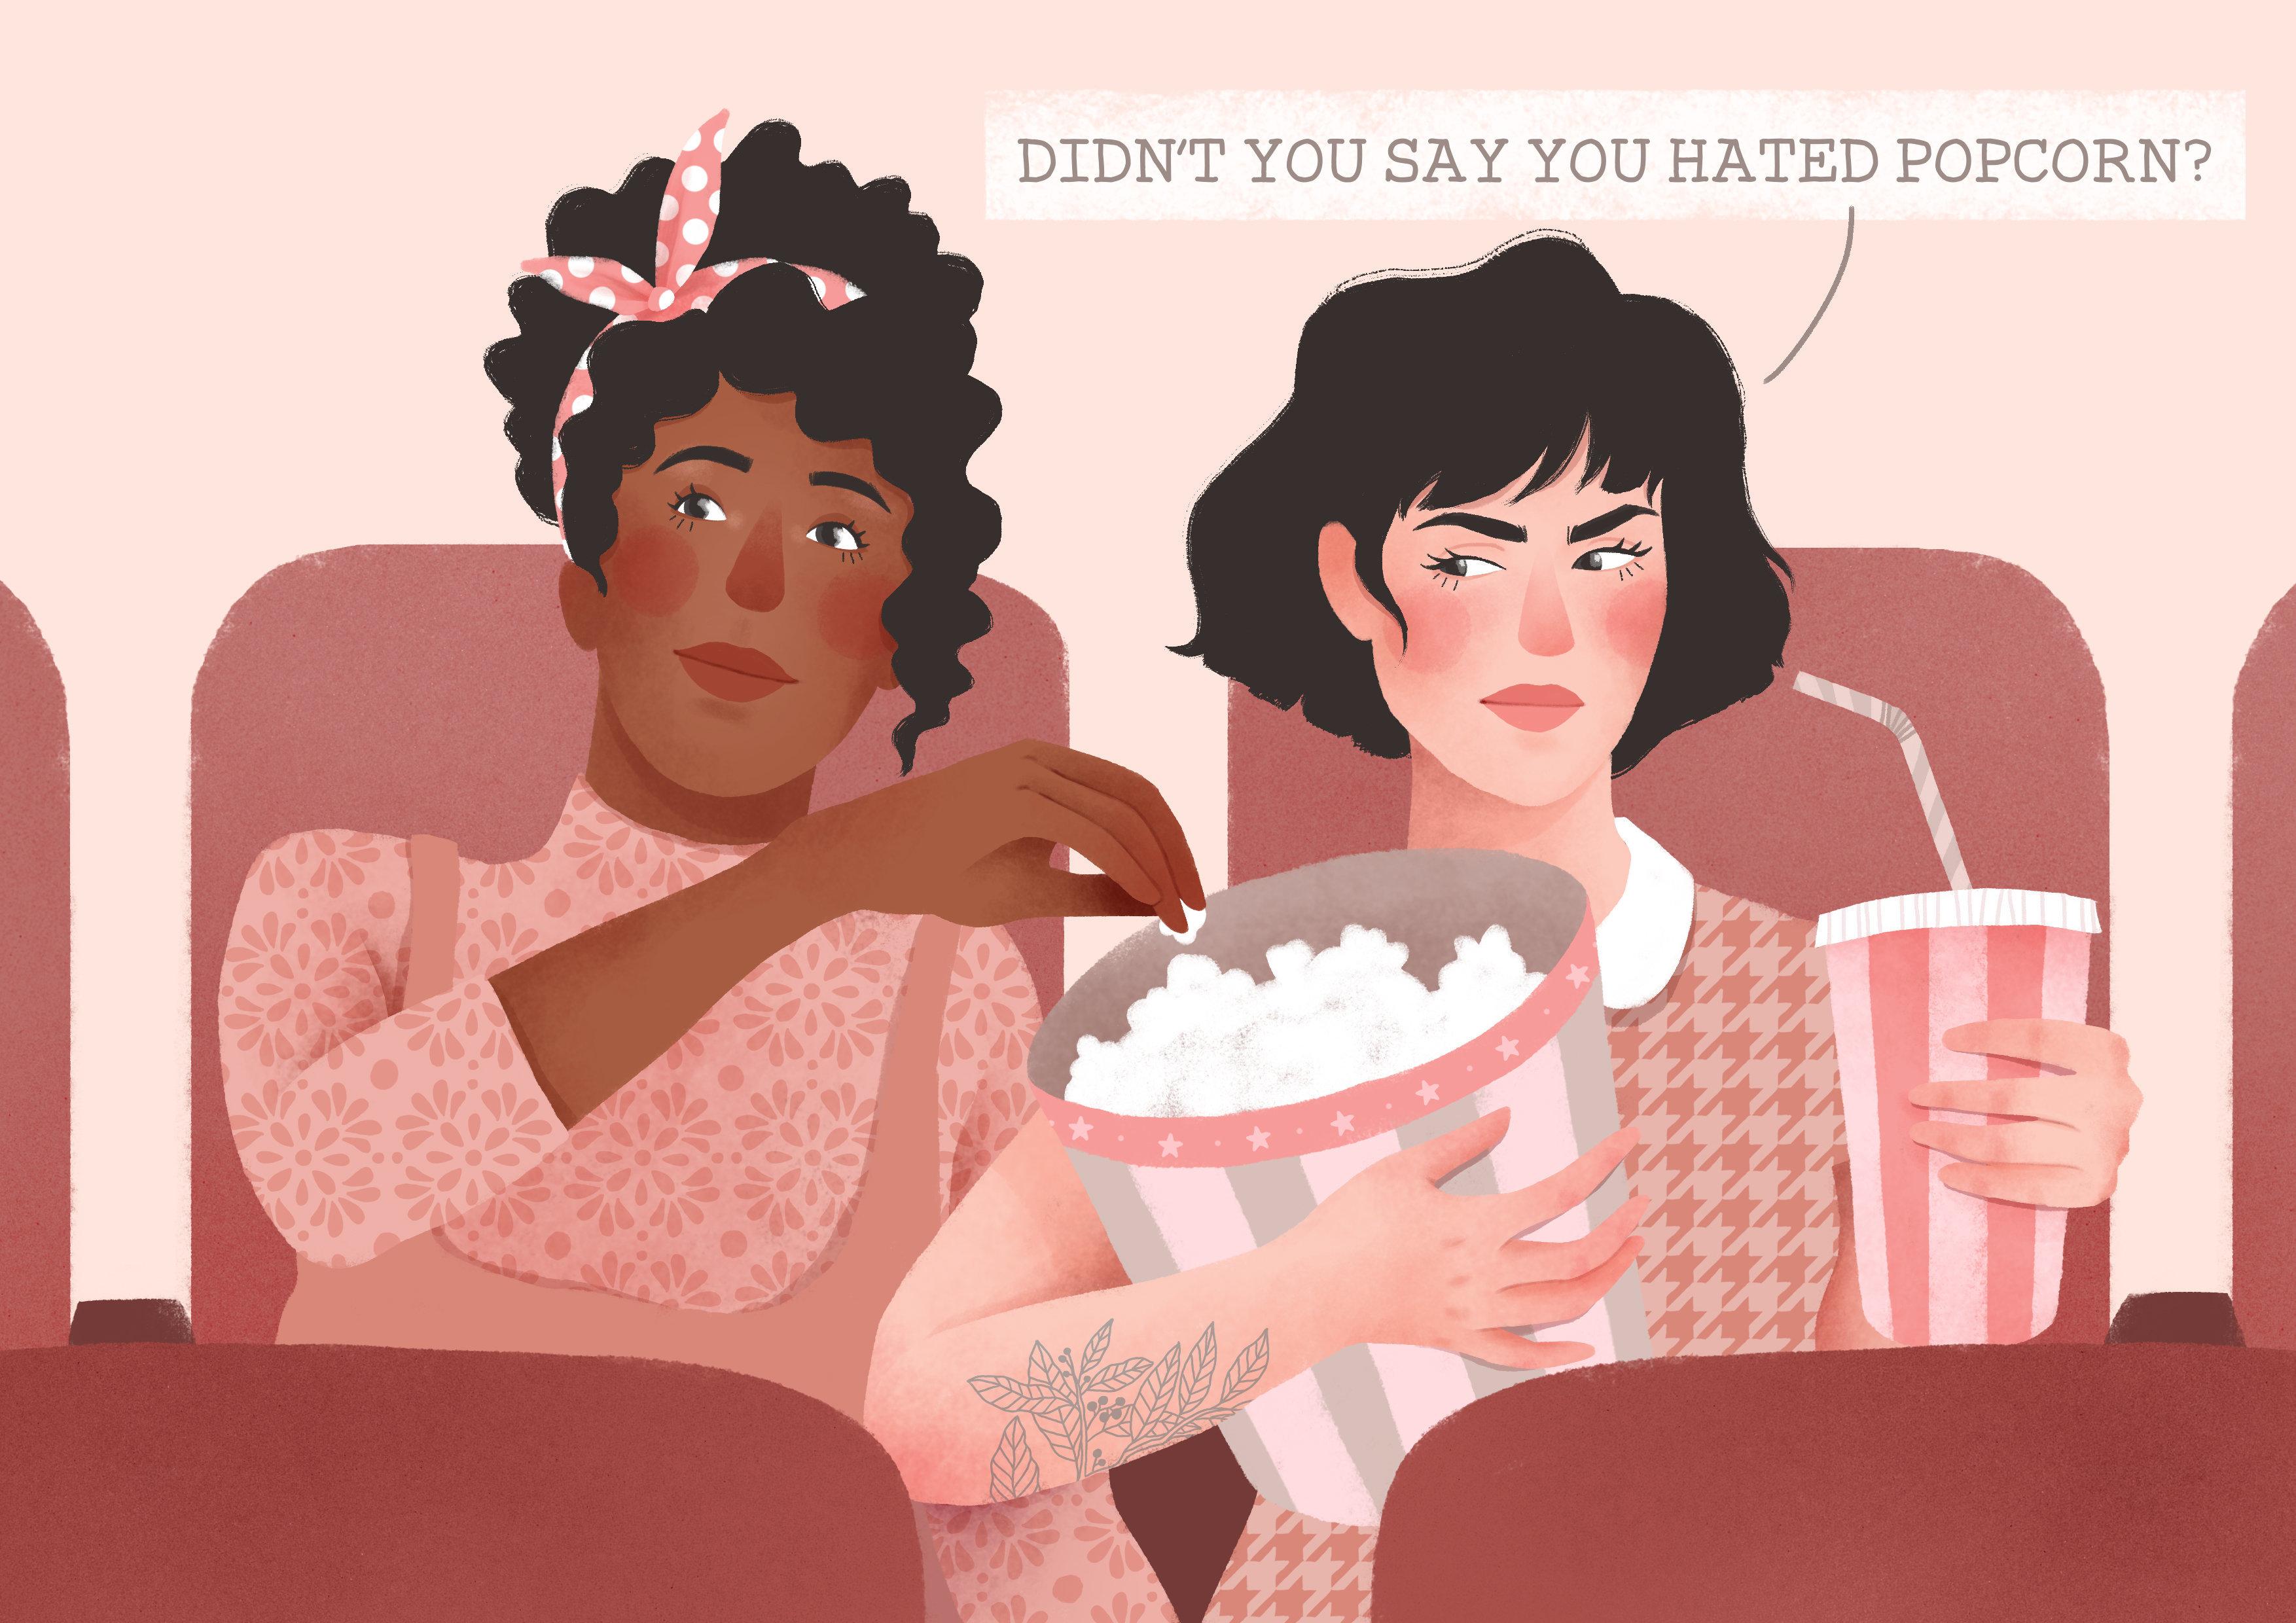 Art provided by Tumblr Creatr Priscila Barbosa